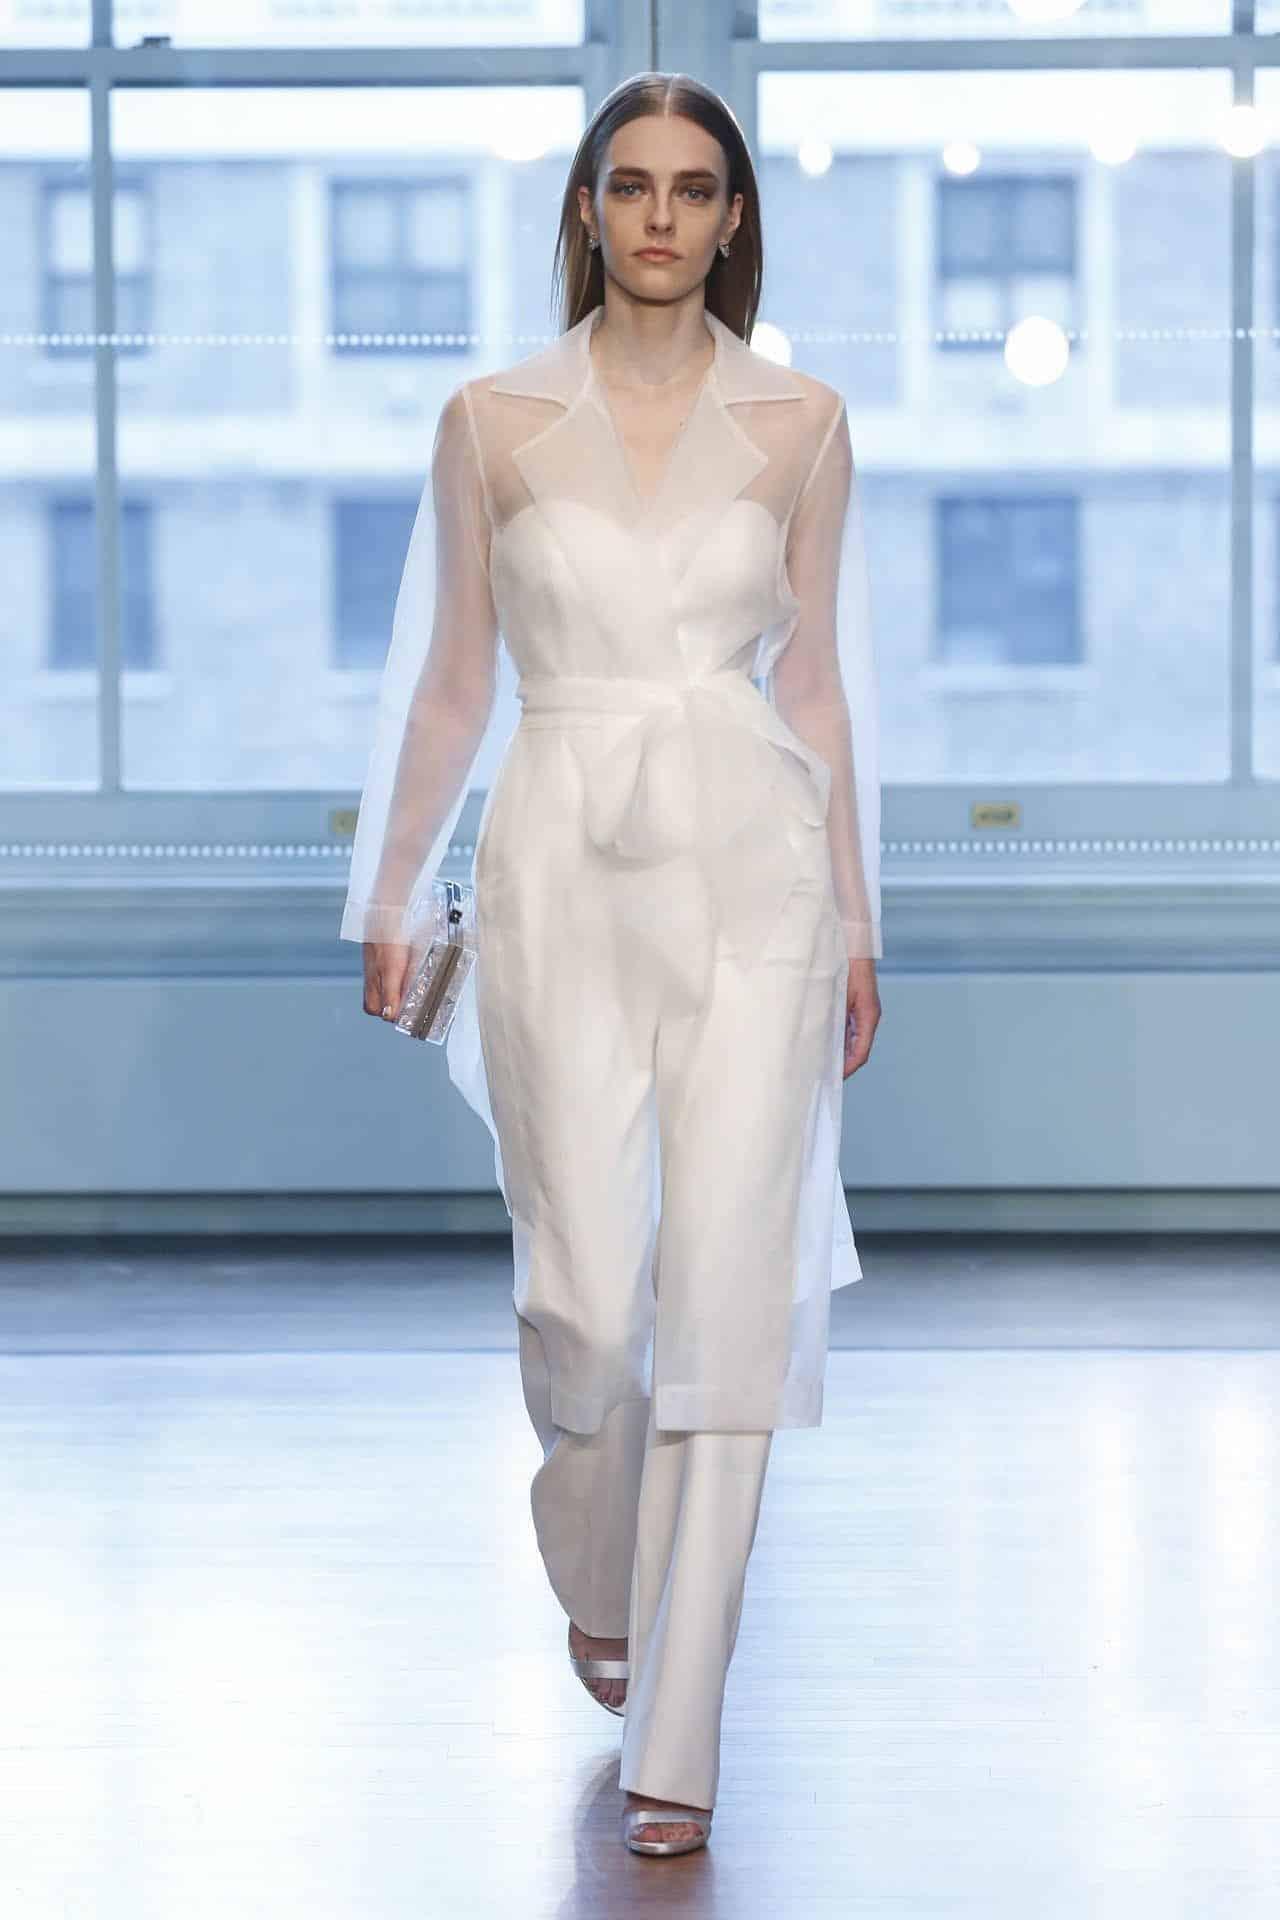 wedding dress with a sea-through jacket by Justin Alexander